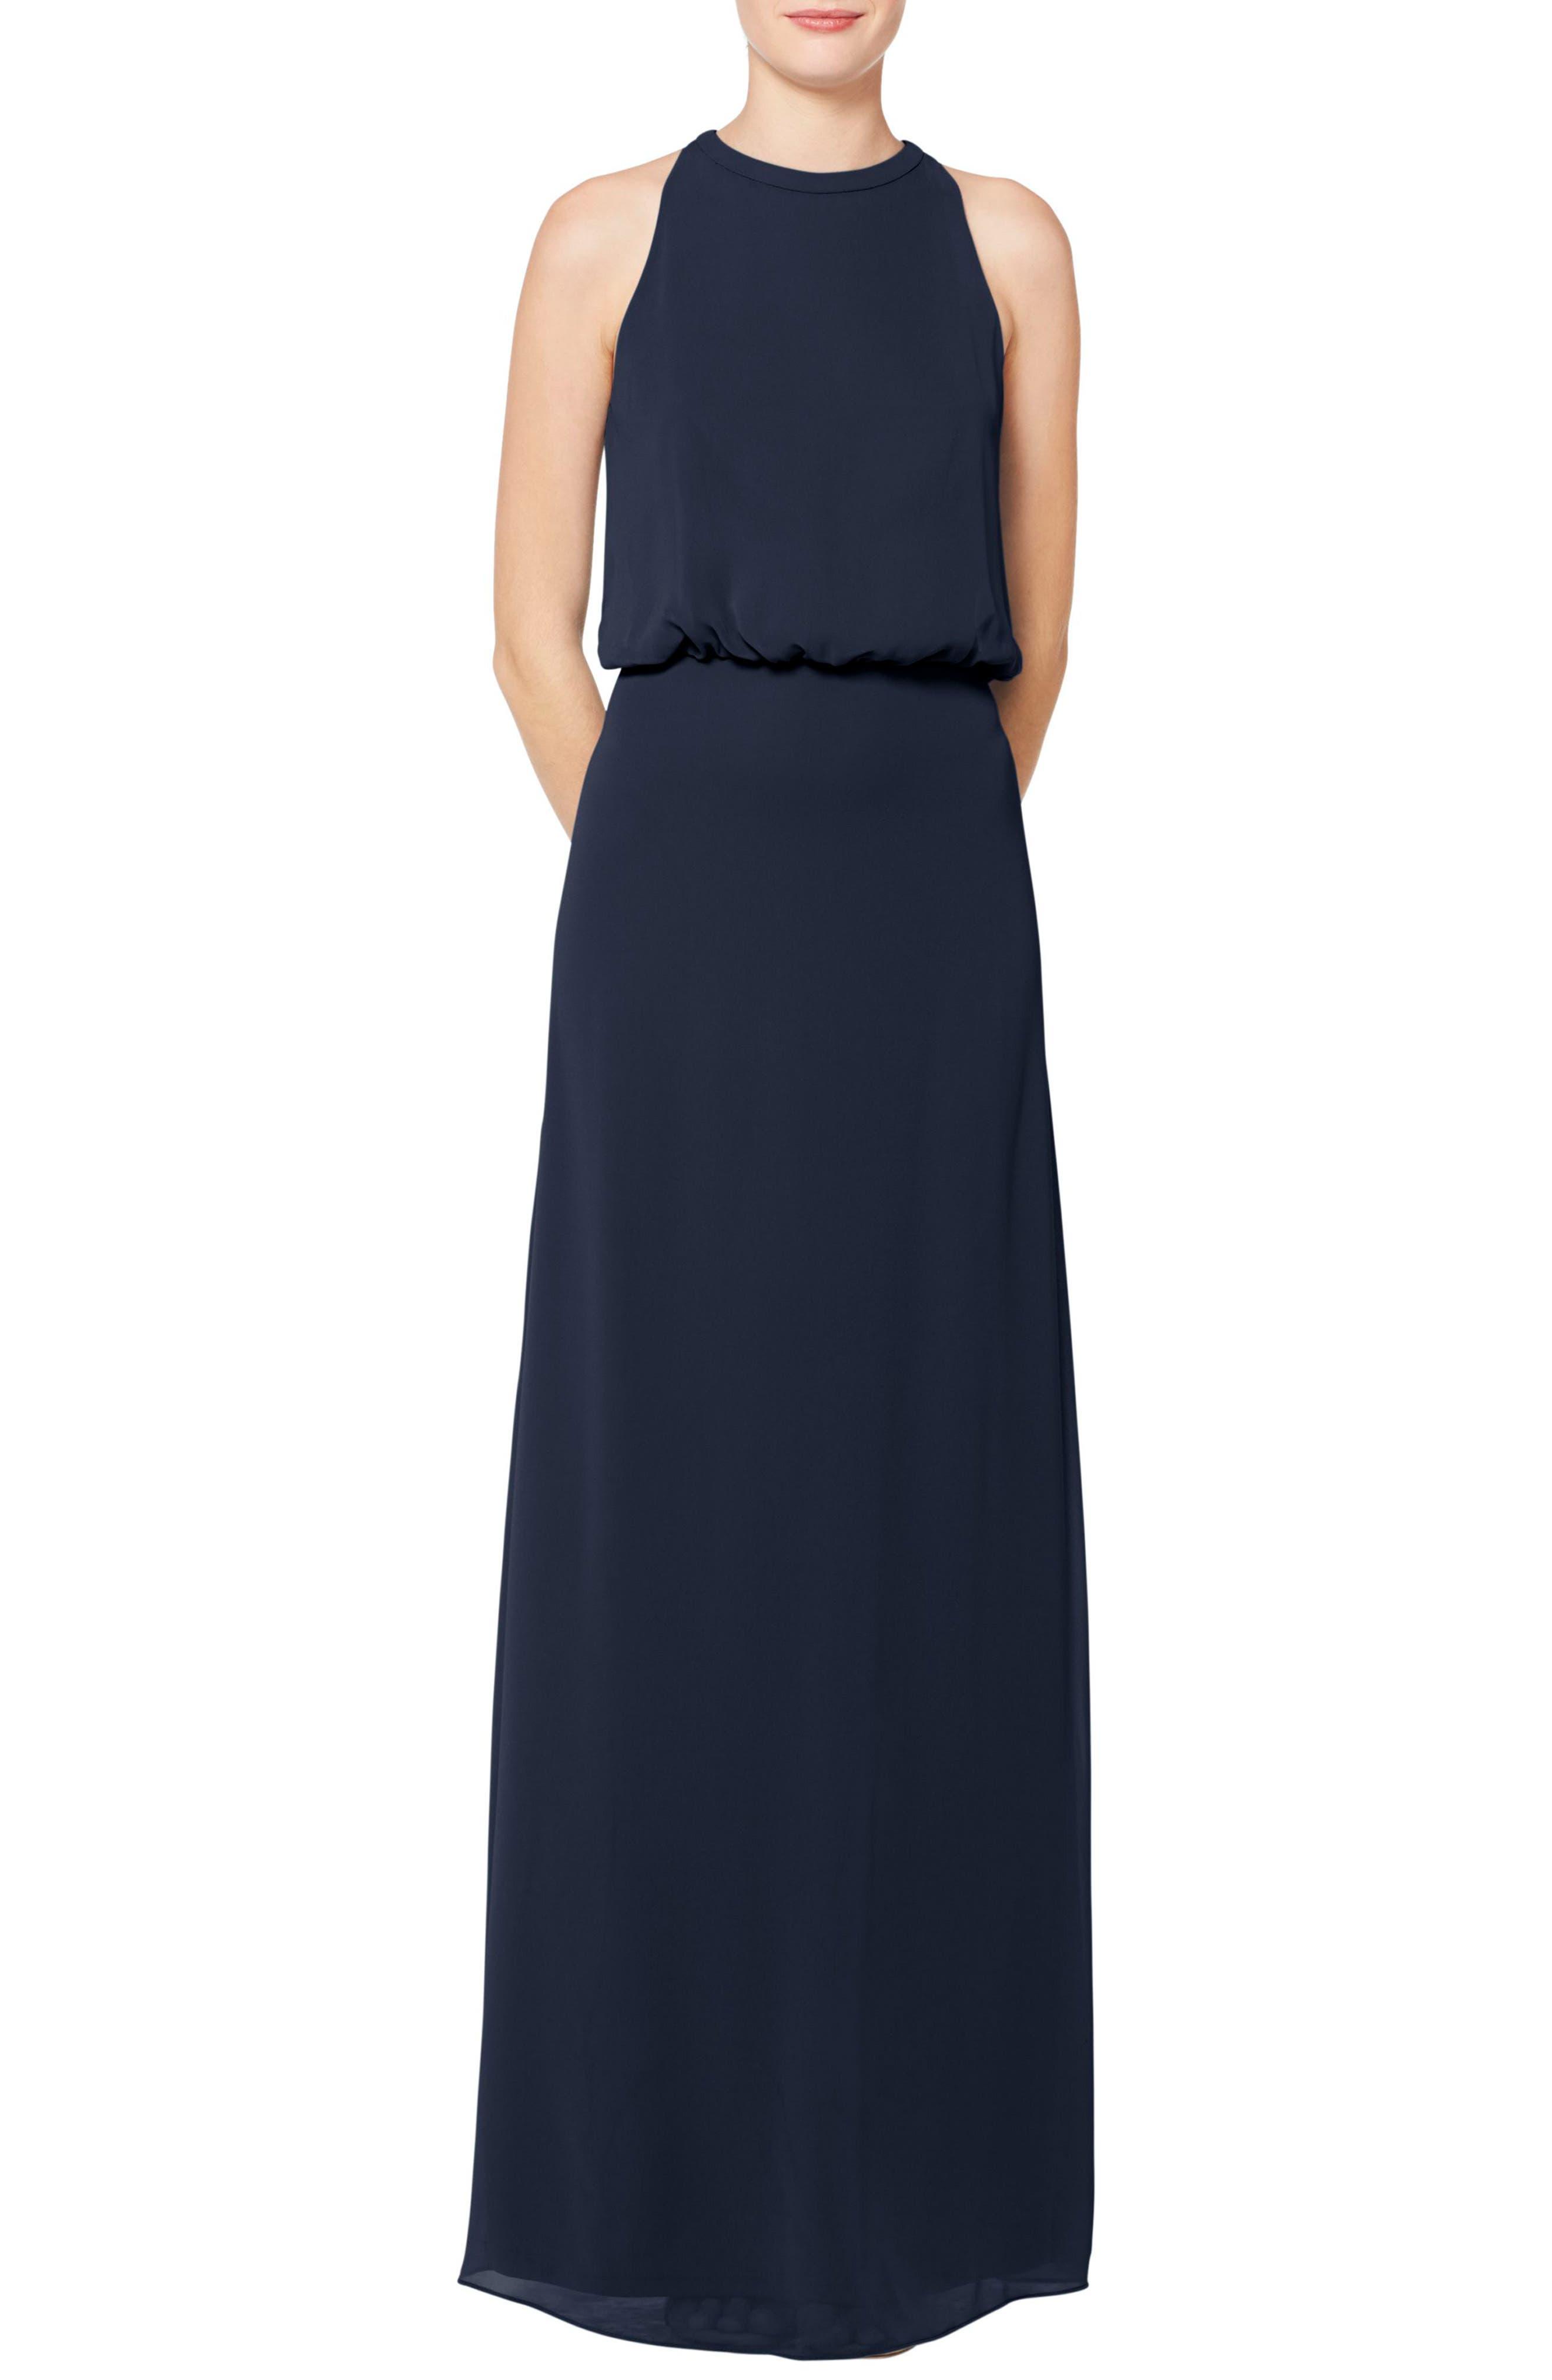 #levkoff Halter Neck Blouson Bodice Chiffon Evening Dress, Blue